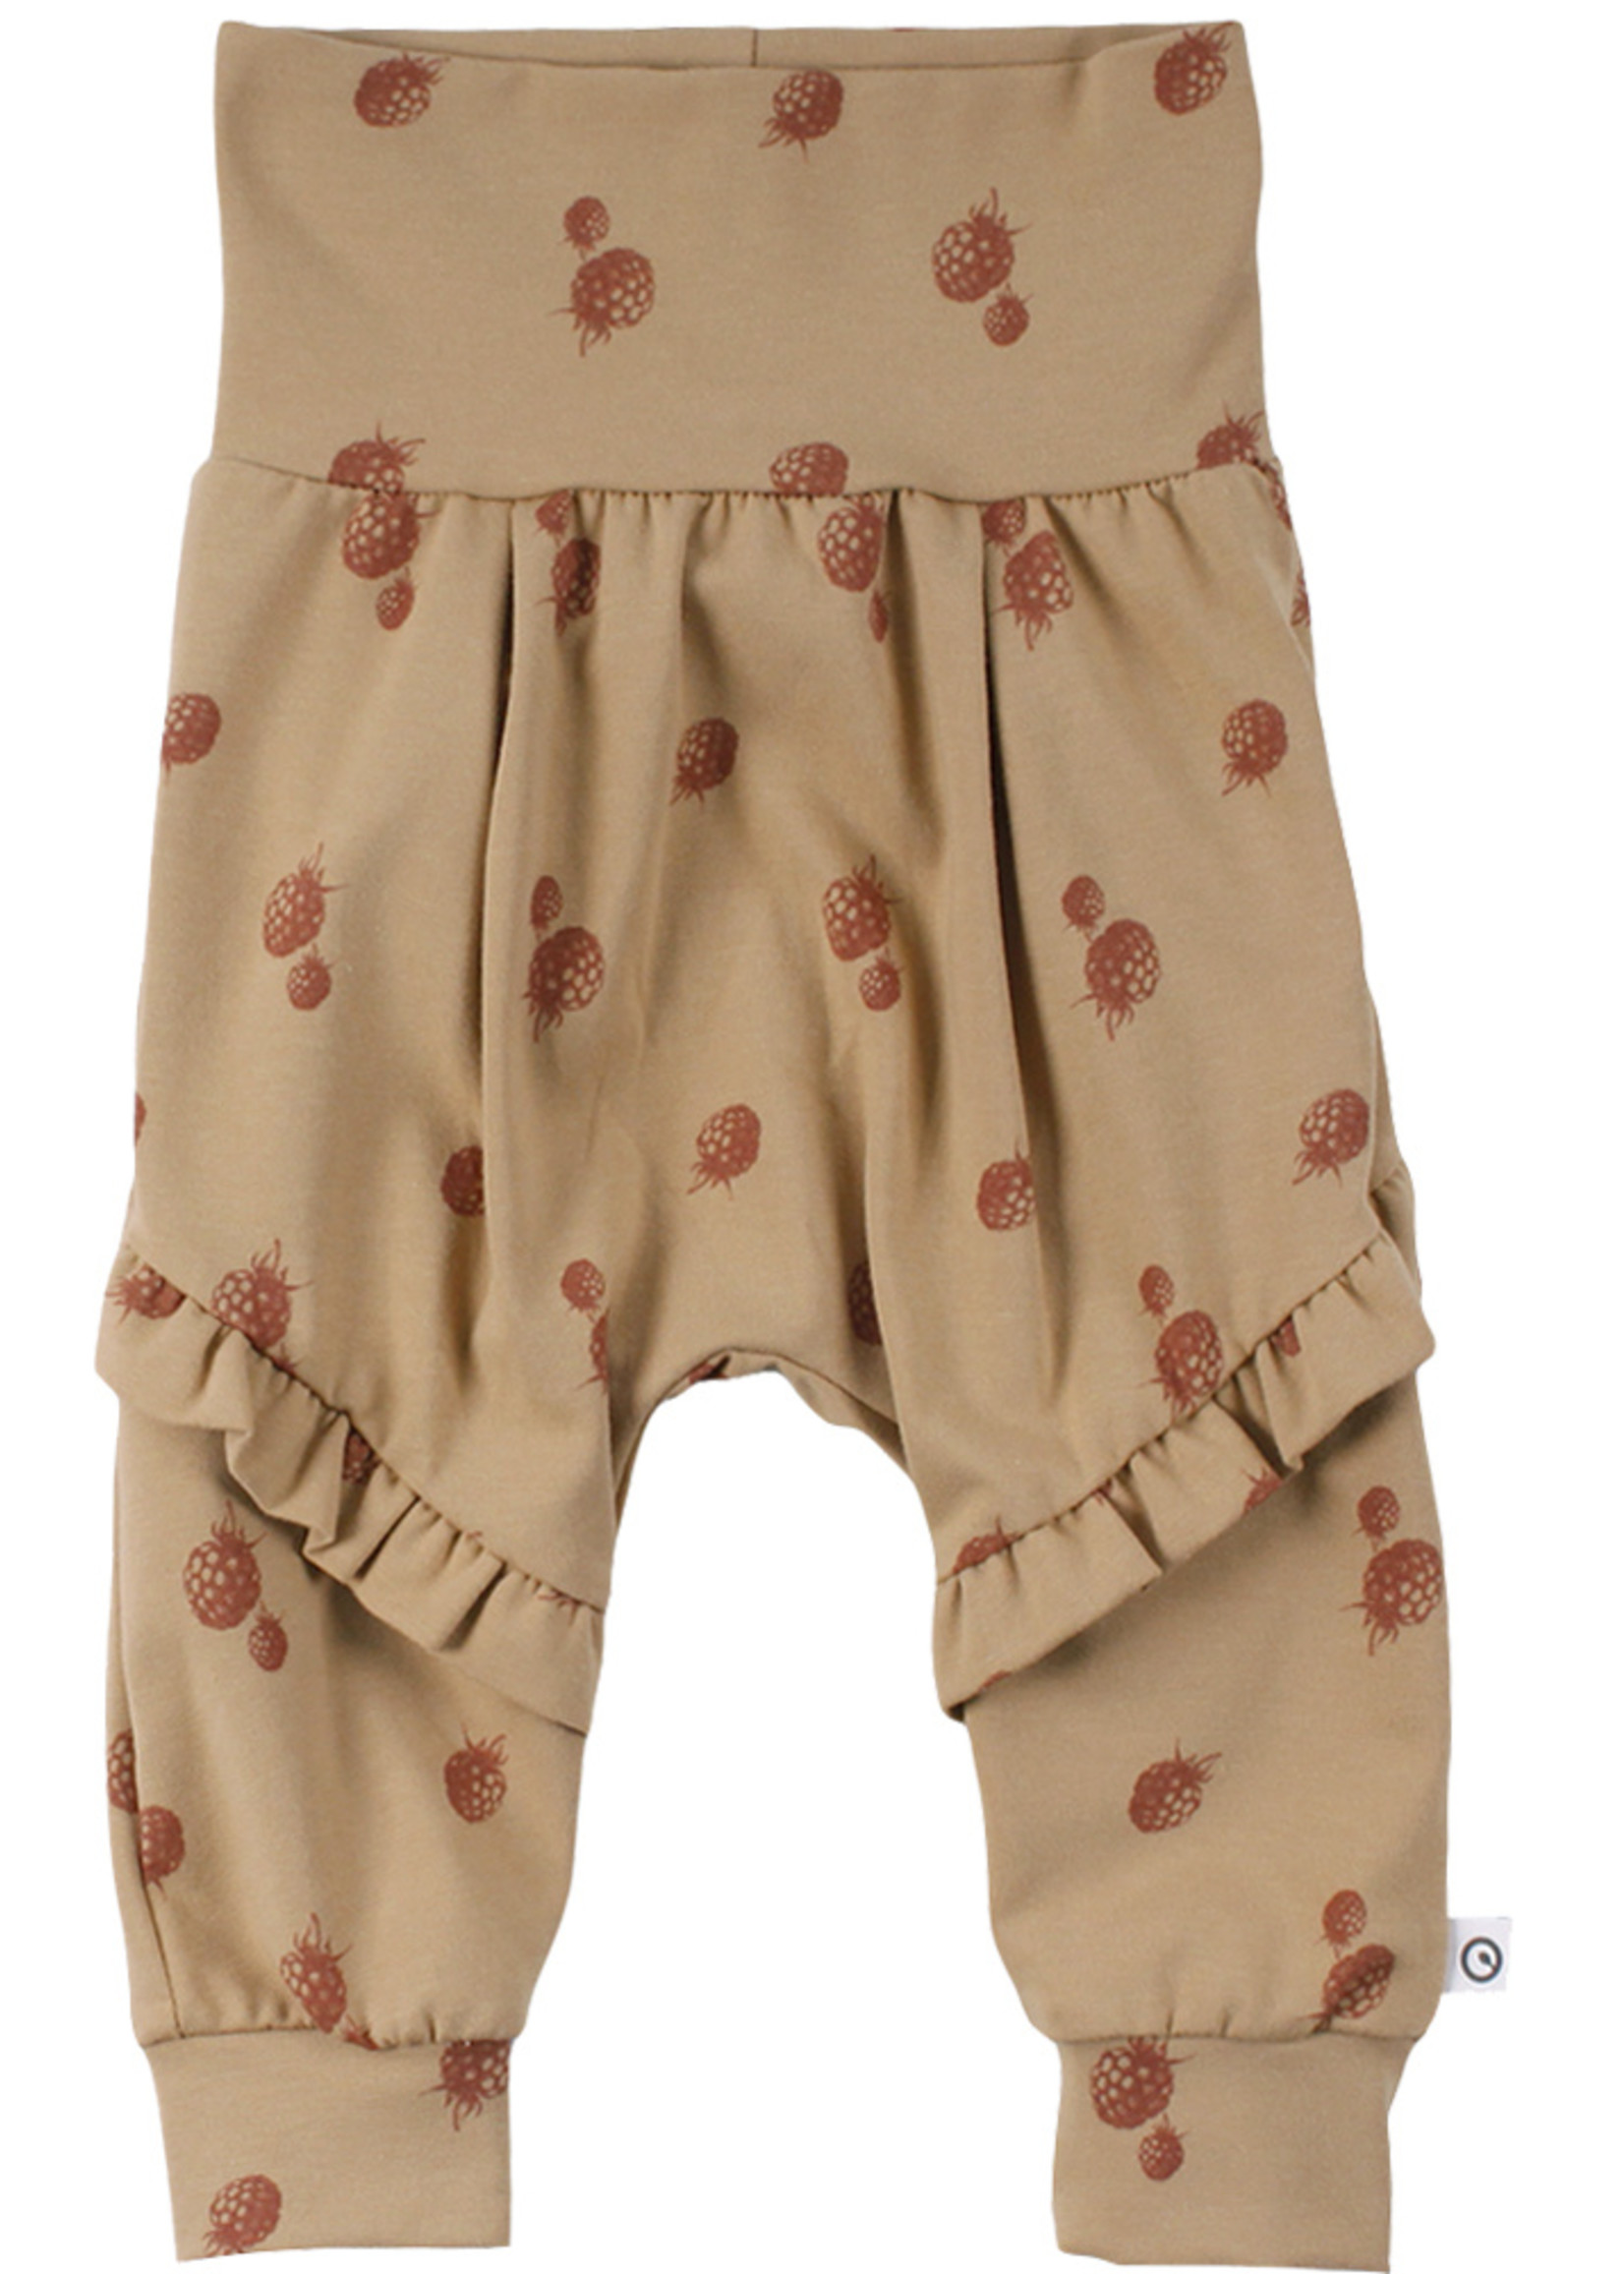 Müsli Müsli - Berry pants - Toffee